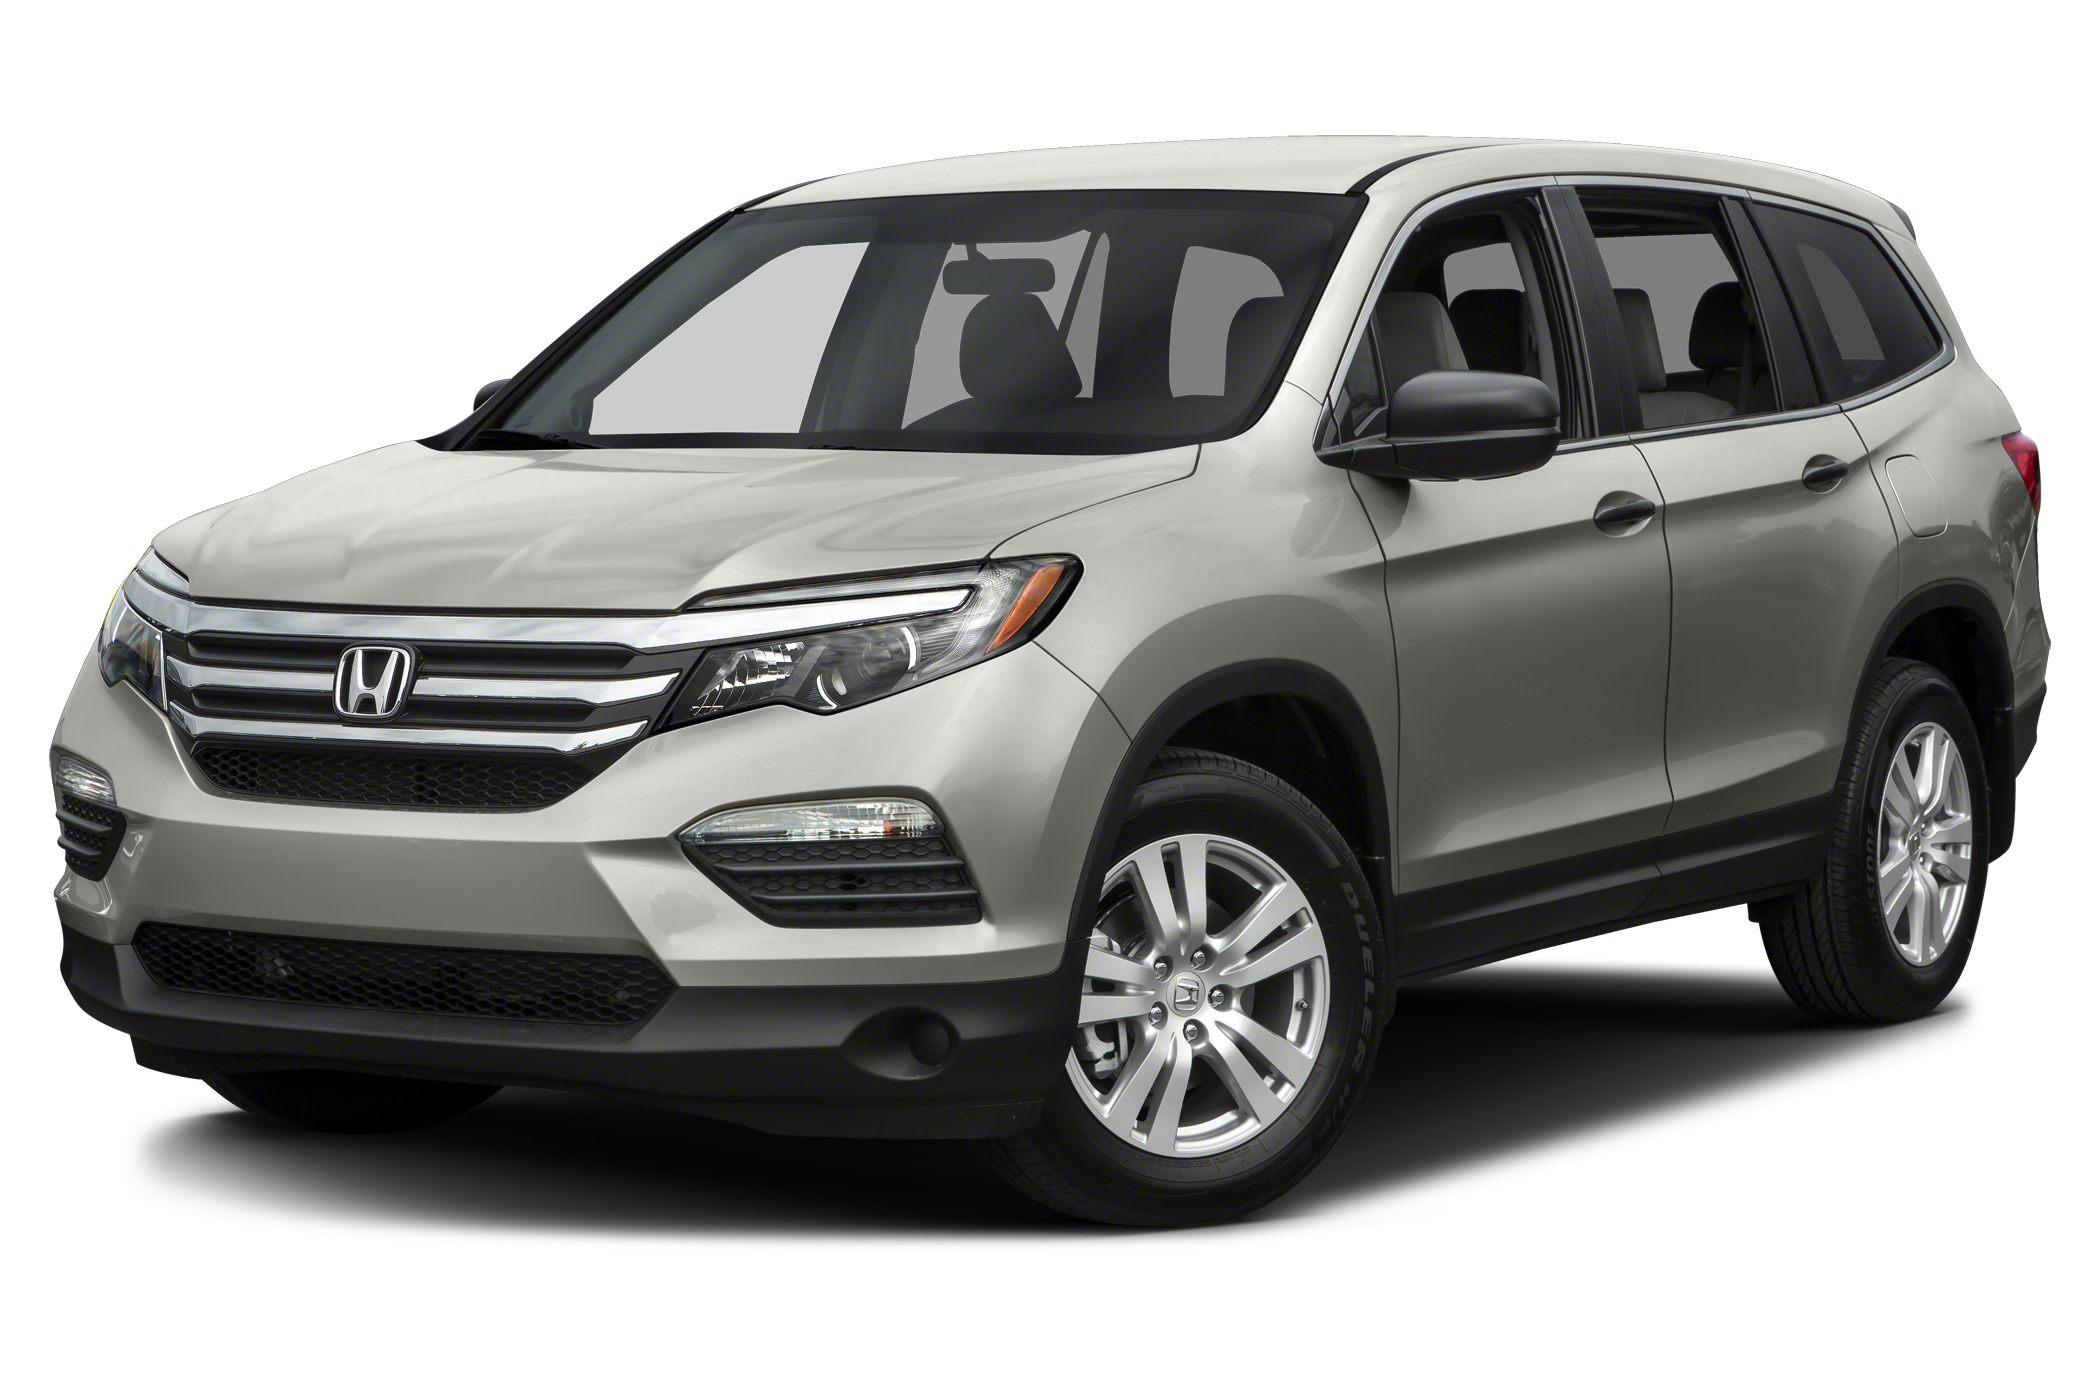 Honda Pilot Colors >> See 2016 Honda Pilot Color Options Carsdirect